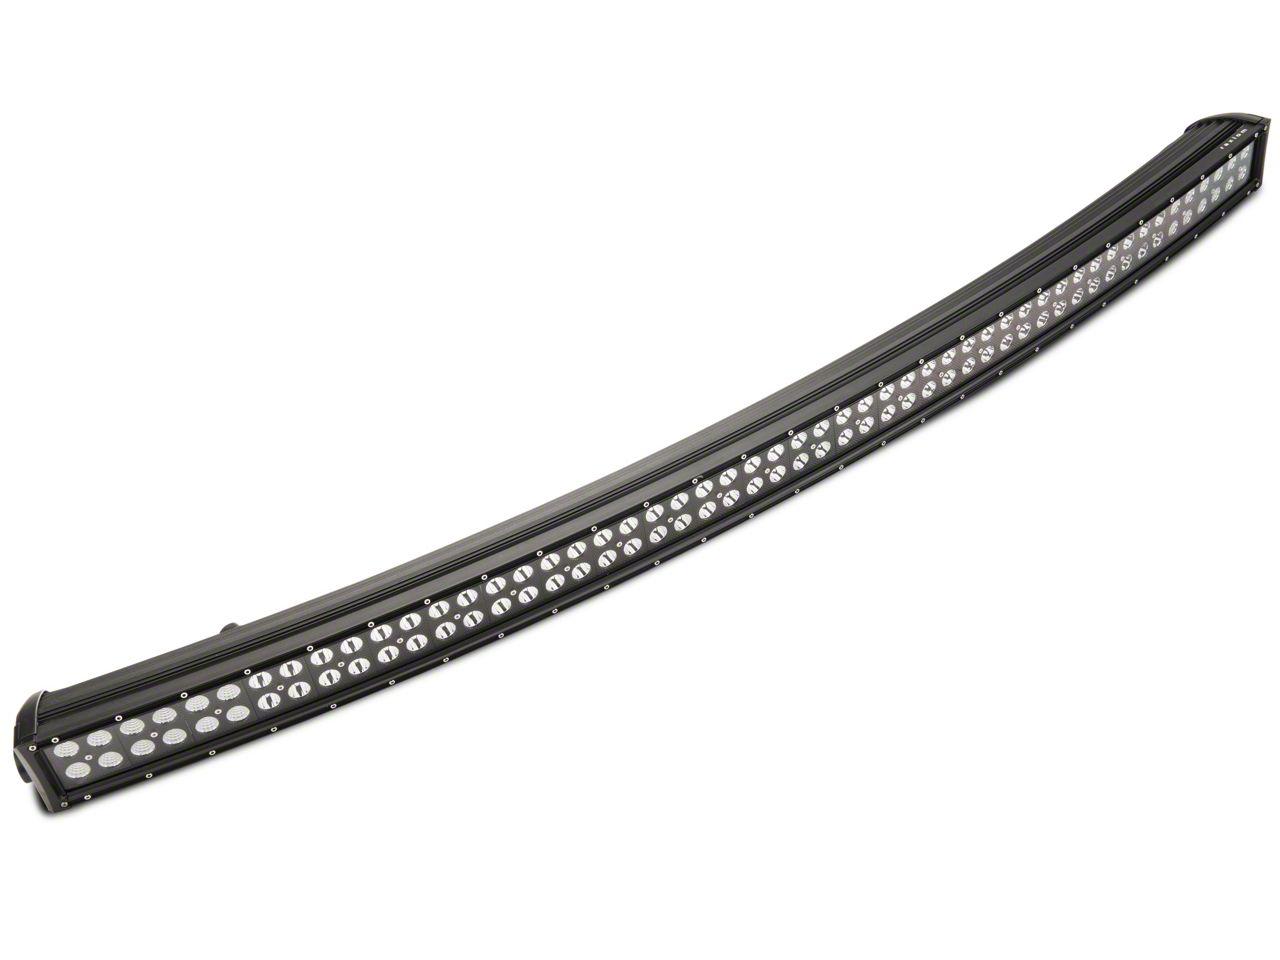 Raxiom 54 in. Dual Row LED Light Bar w/ Roof Mounting Brackets (07-13 Sierra 1500)